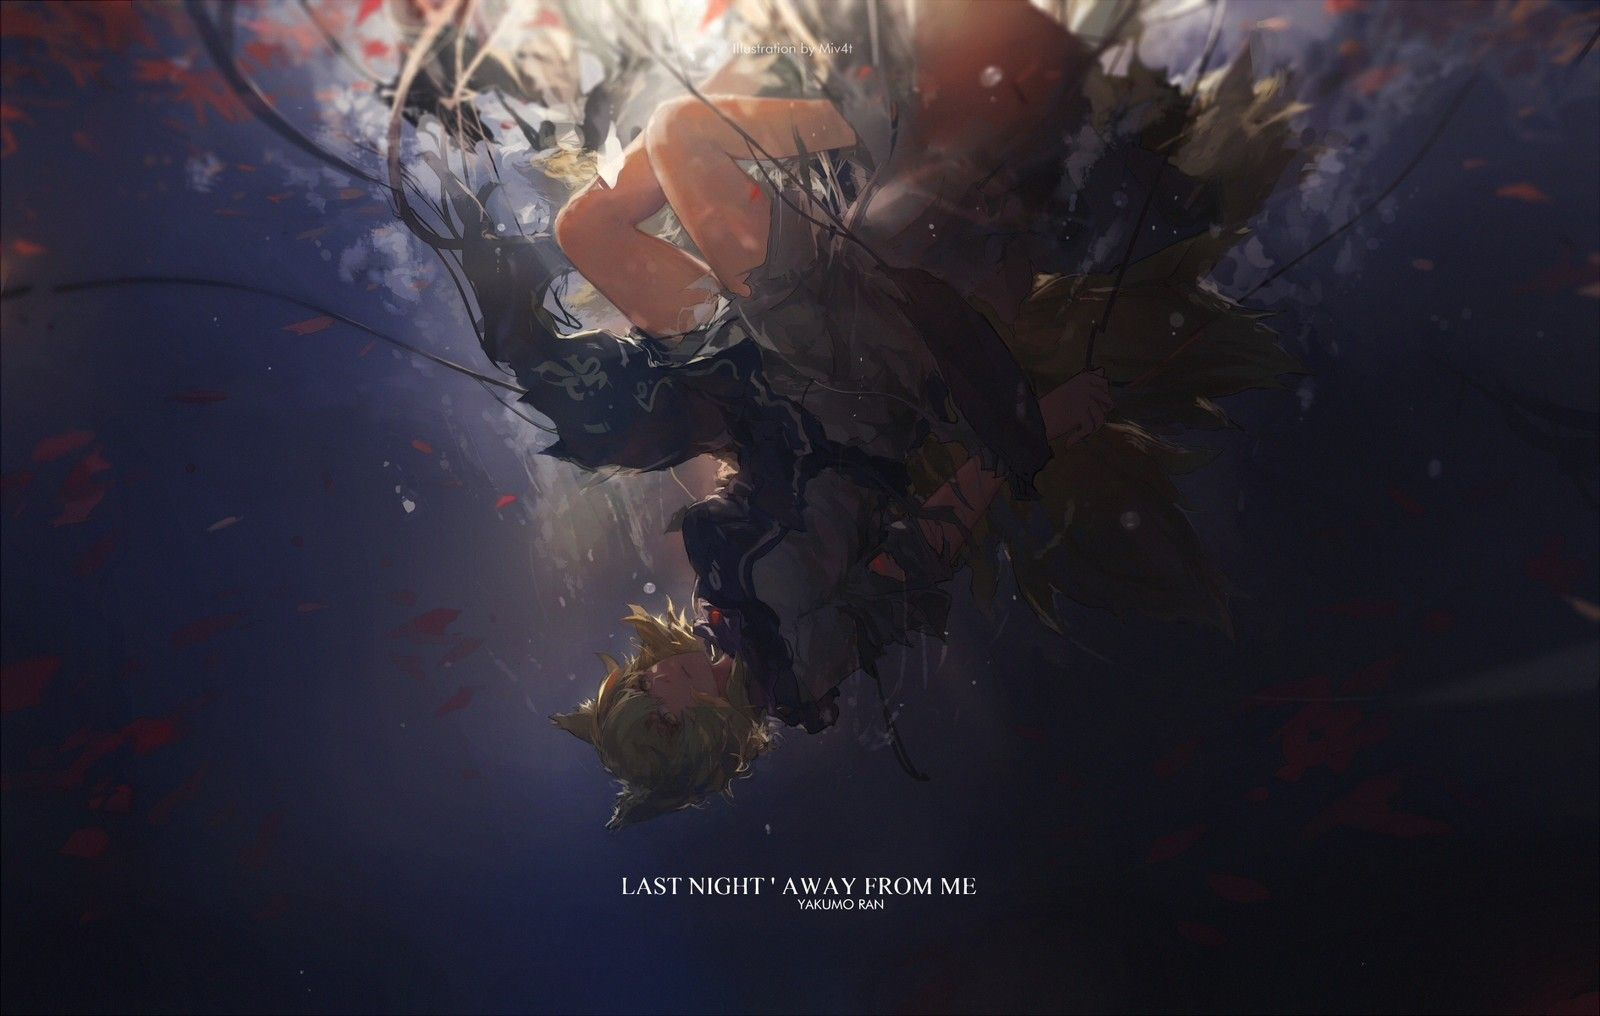 LAST NIGHT 'AWAY FROM ME, Minority 4 on ArtStation at https://www.artstation.com/artwork/LkG0P